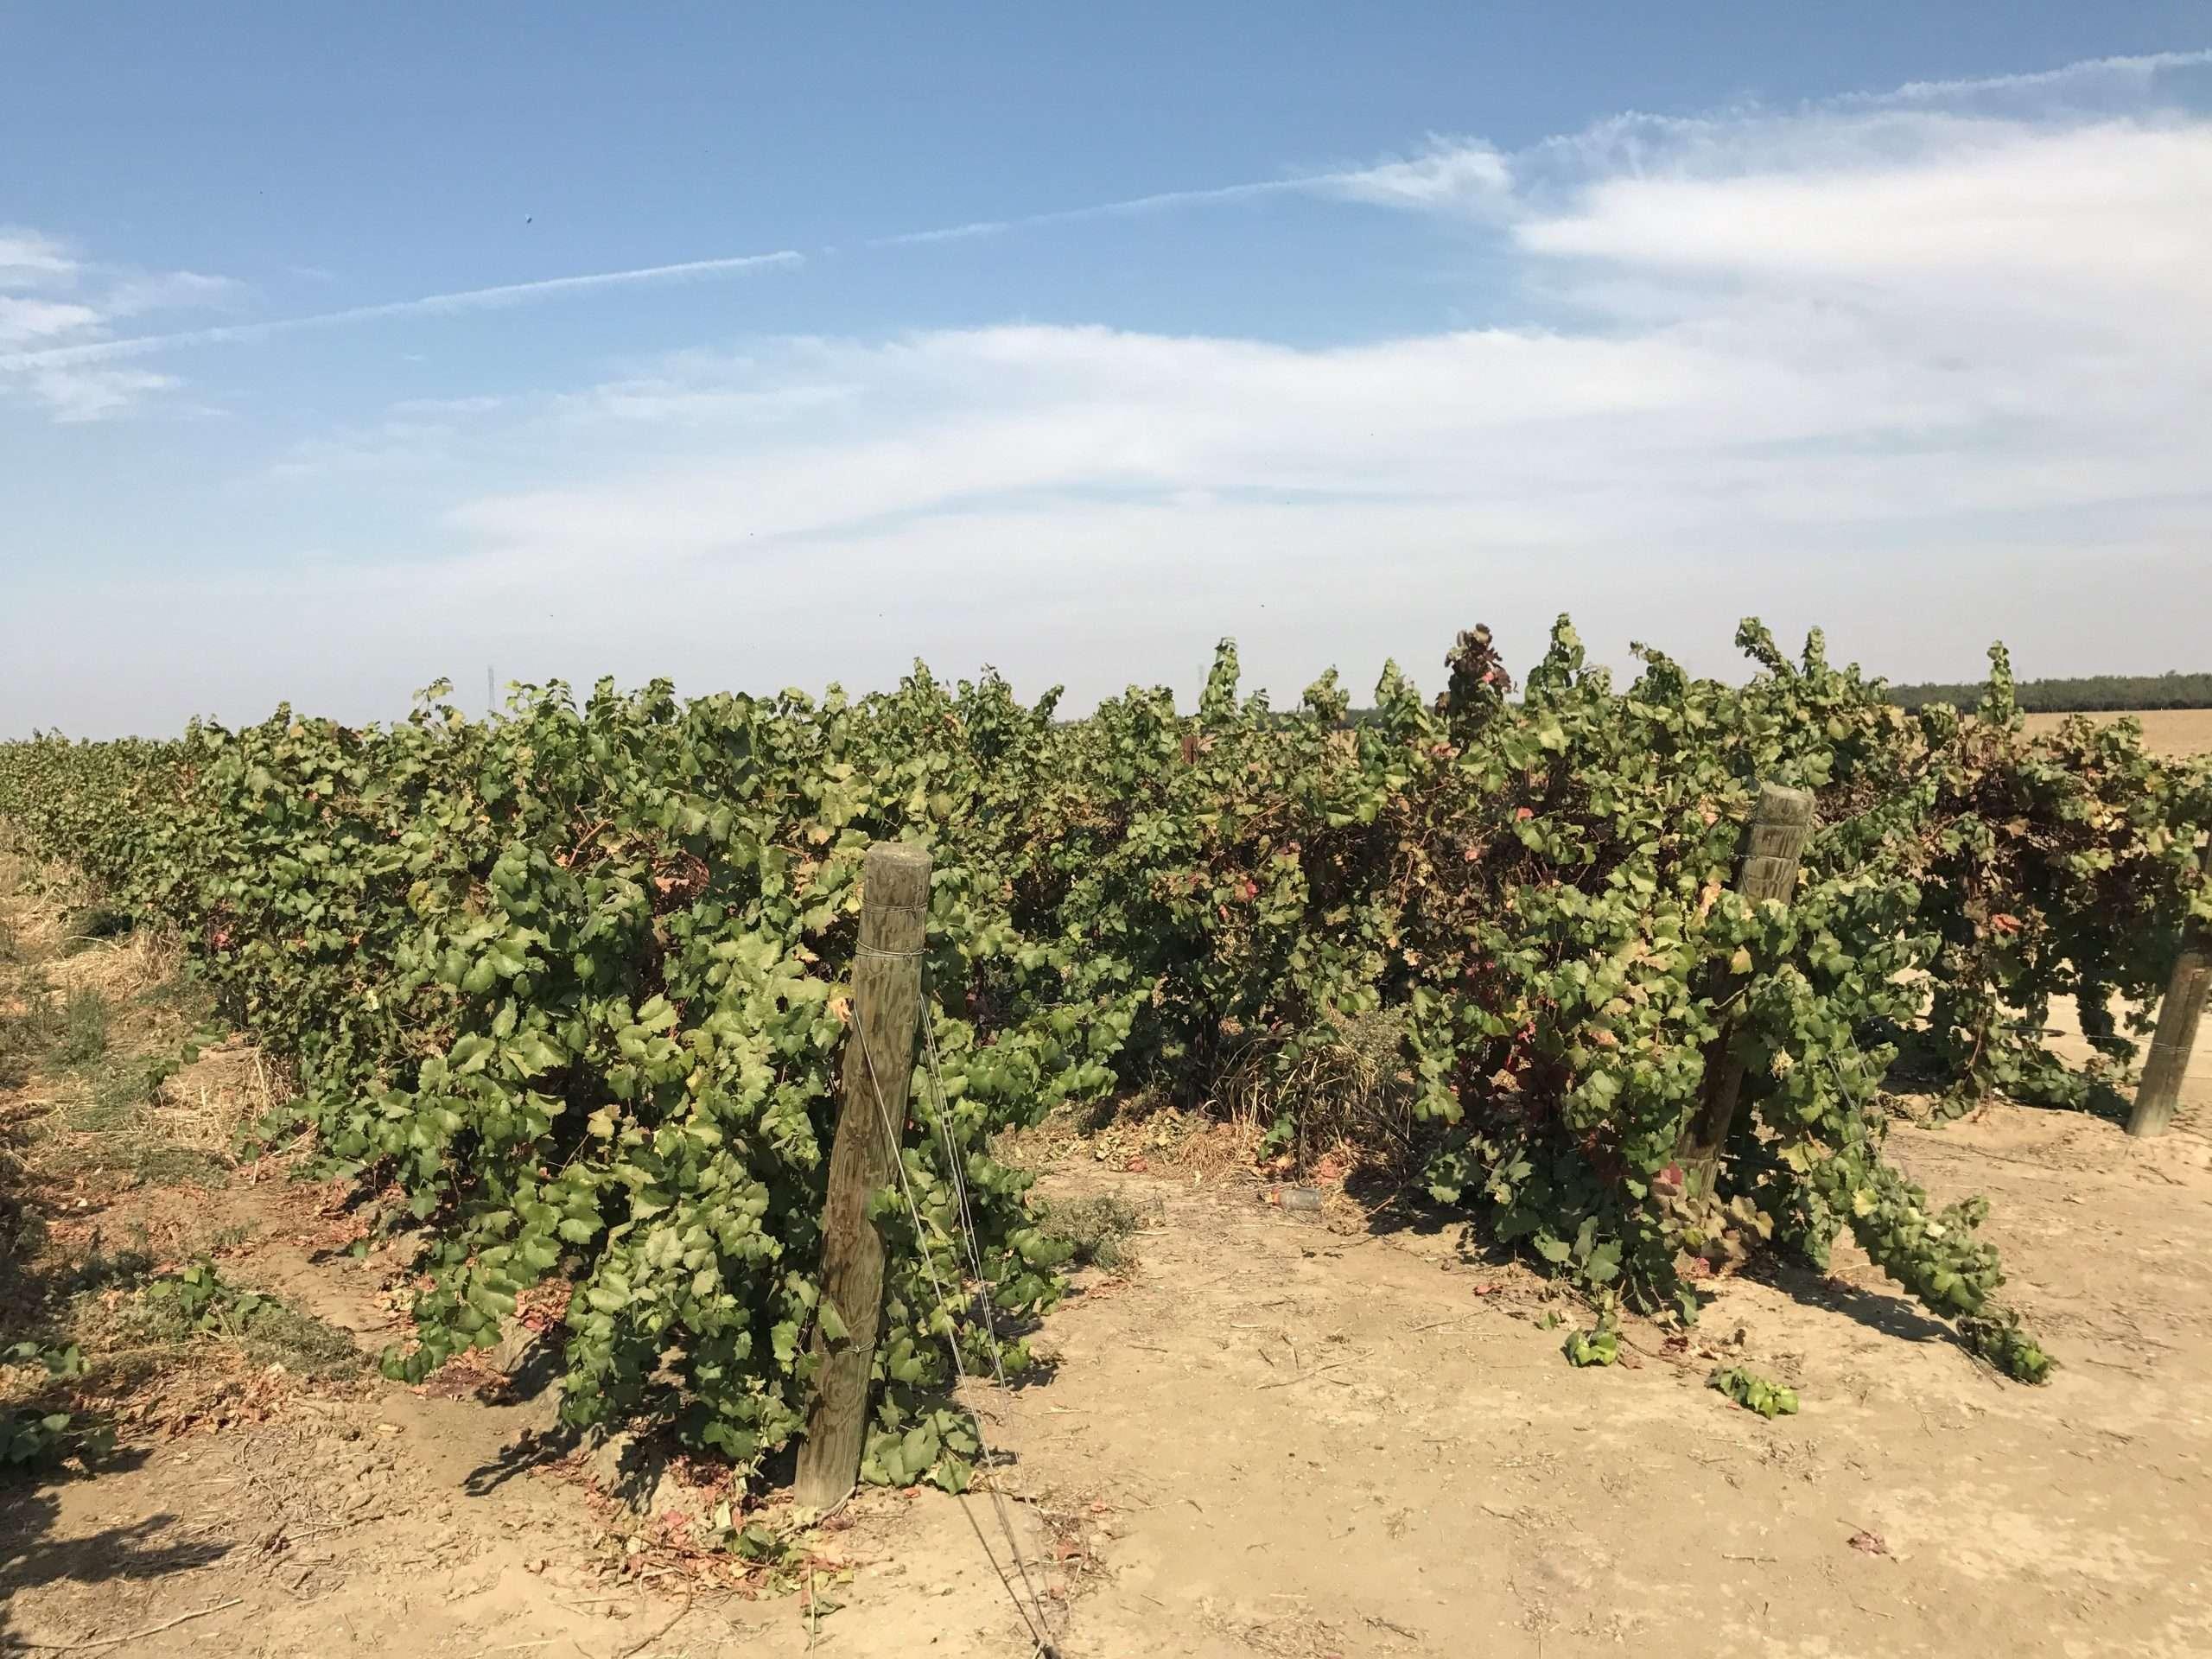 640.57 Ac. Vines, Walnuts & Open, Fresno County